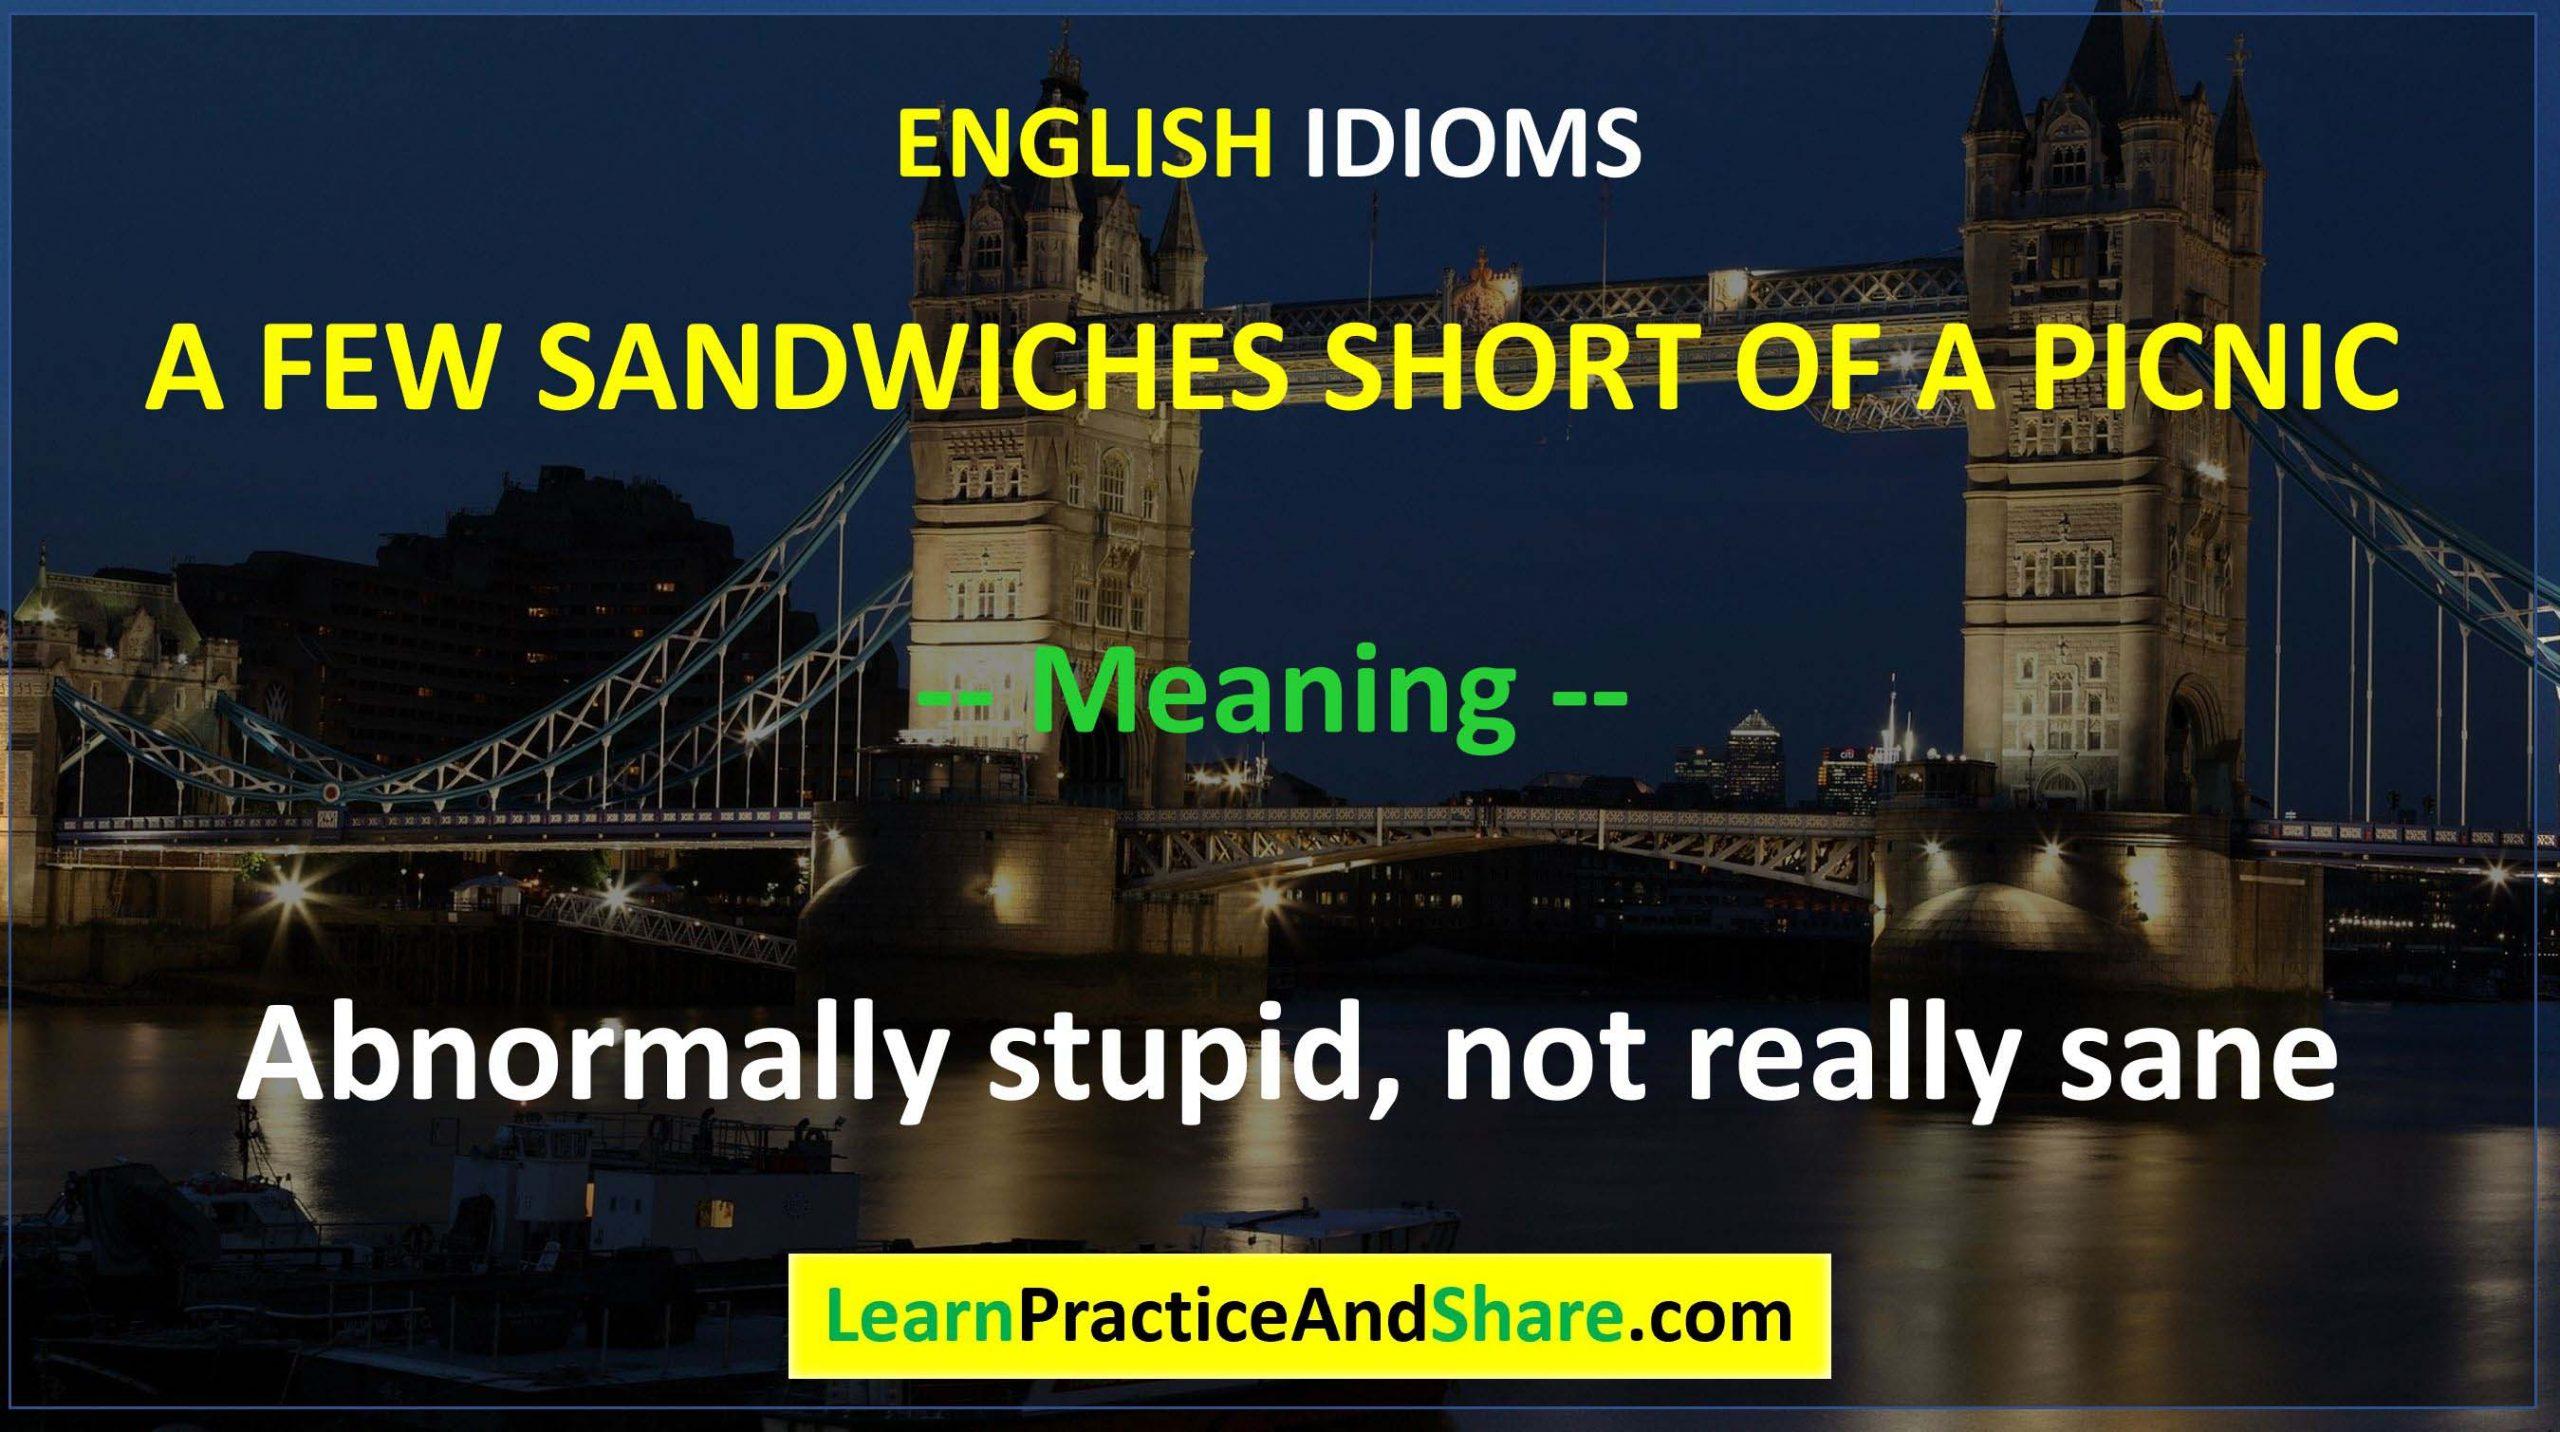 English Idiom - A Few Sandwiches Short Of A Picnic